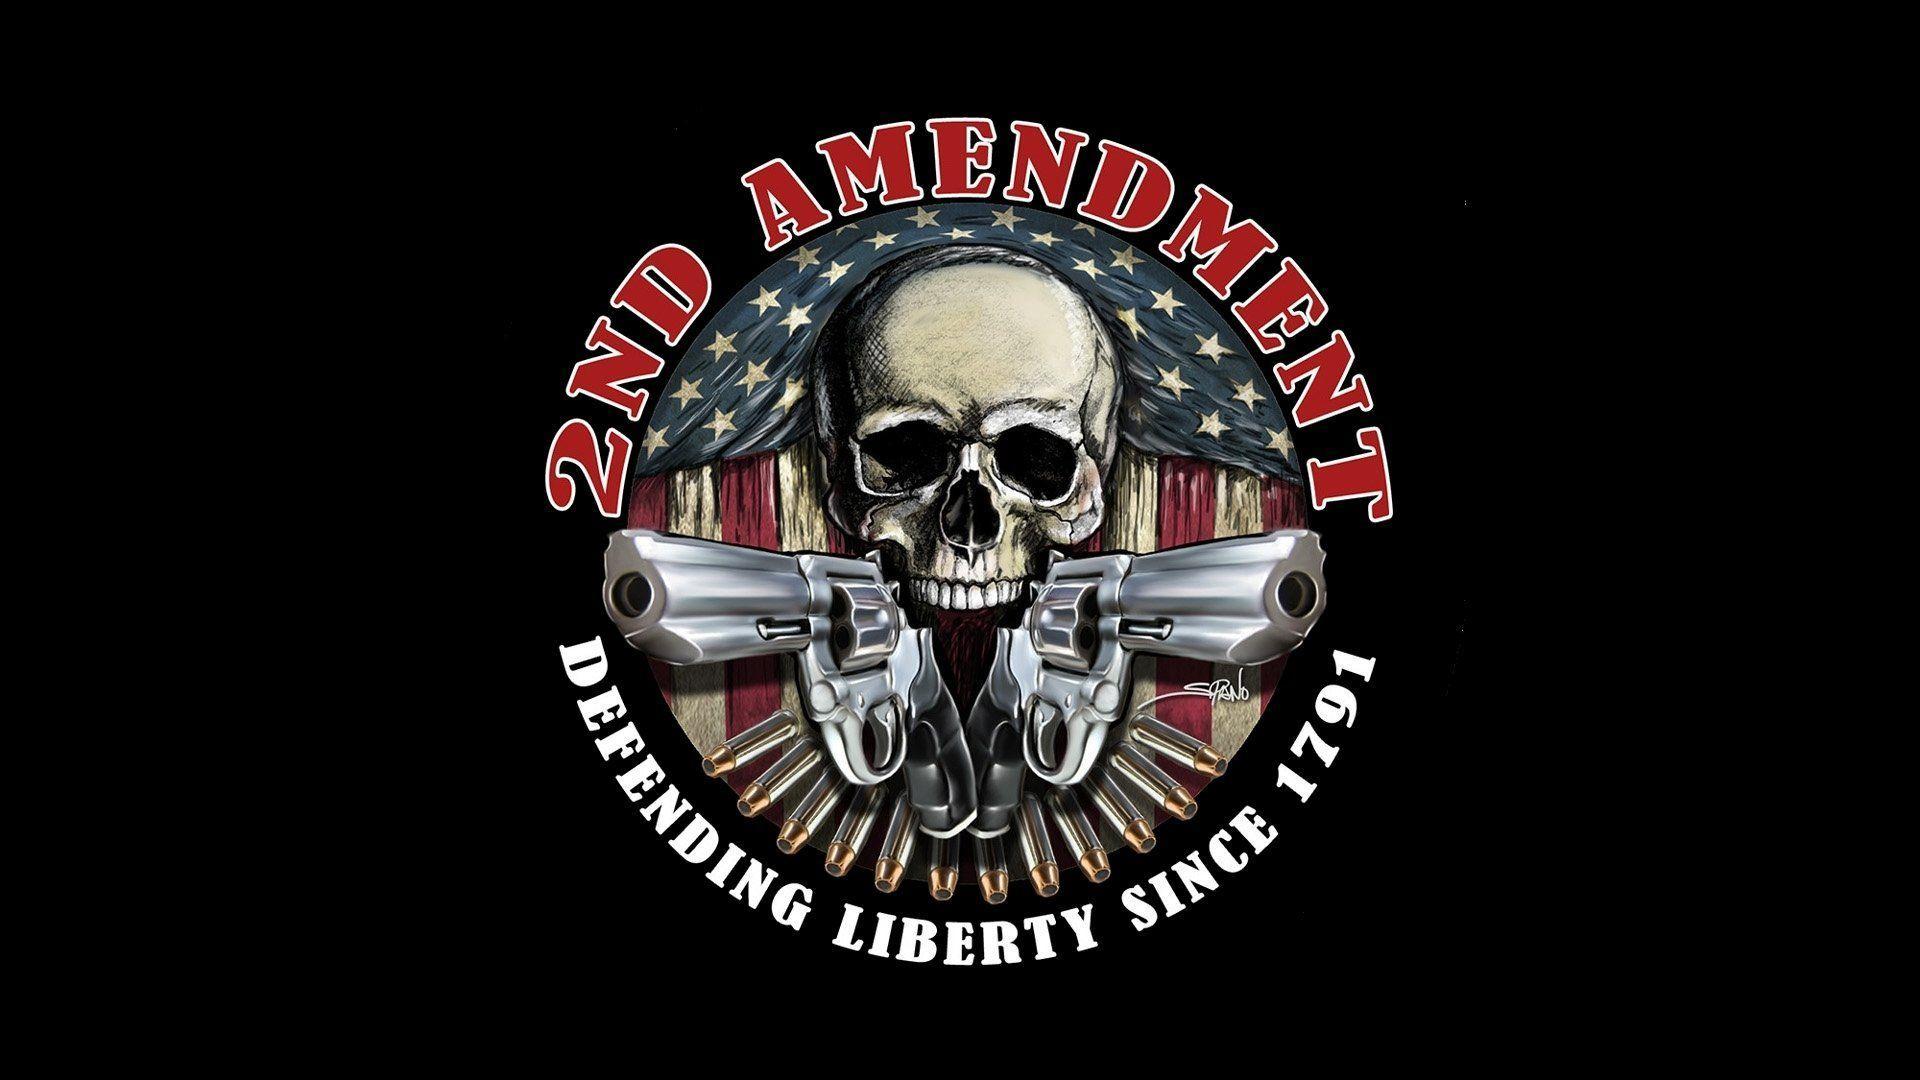 2nd Amendment Wallpapers Top Free 2nd Amendment Backgrounds